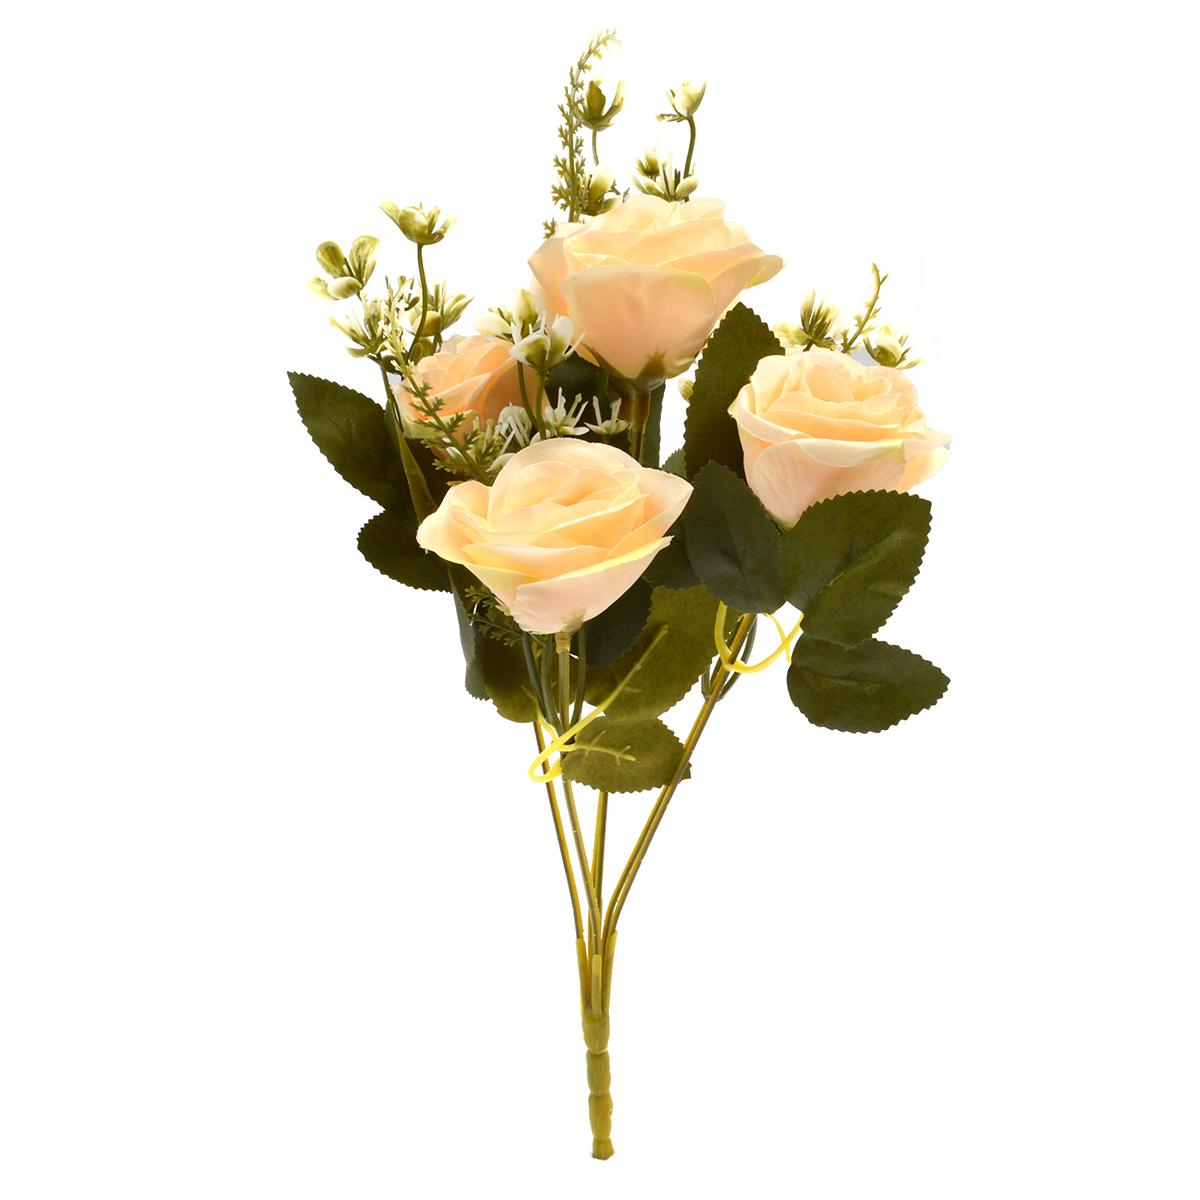 Flori Buchet 6 Trandafiri Madame piersica